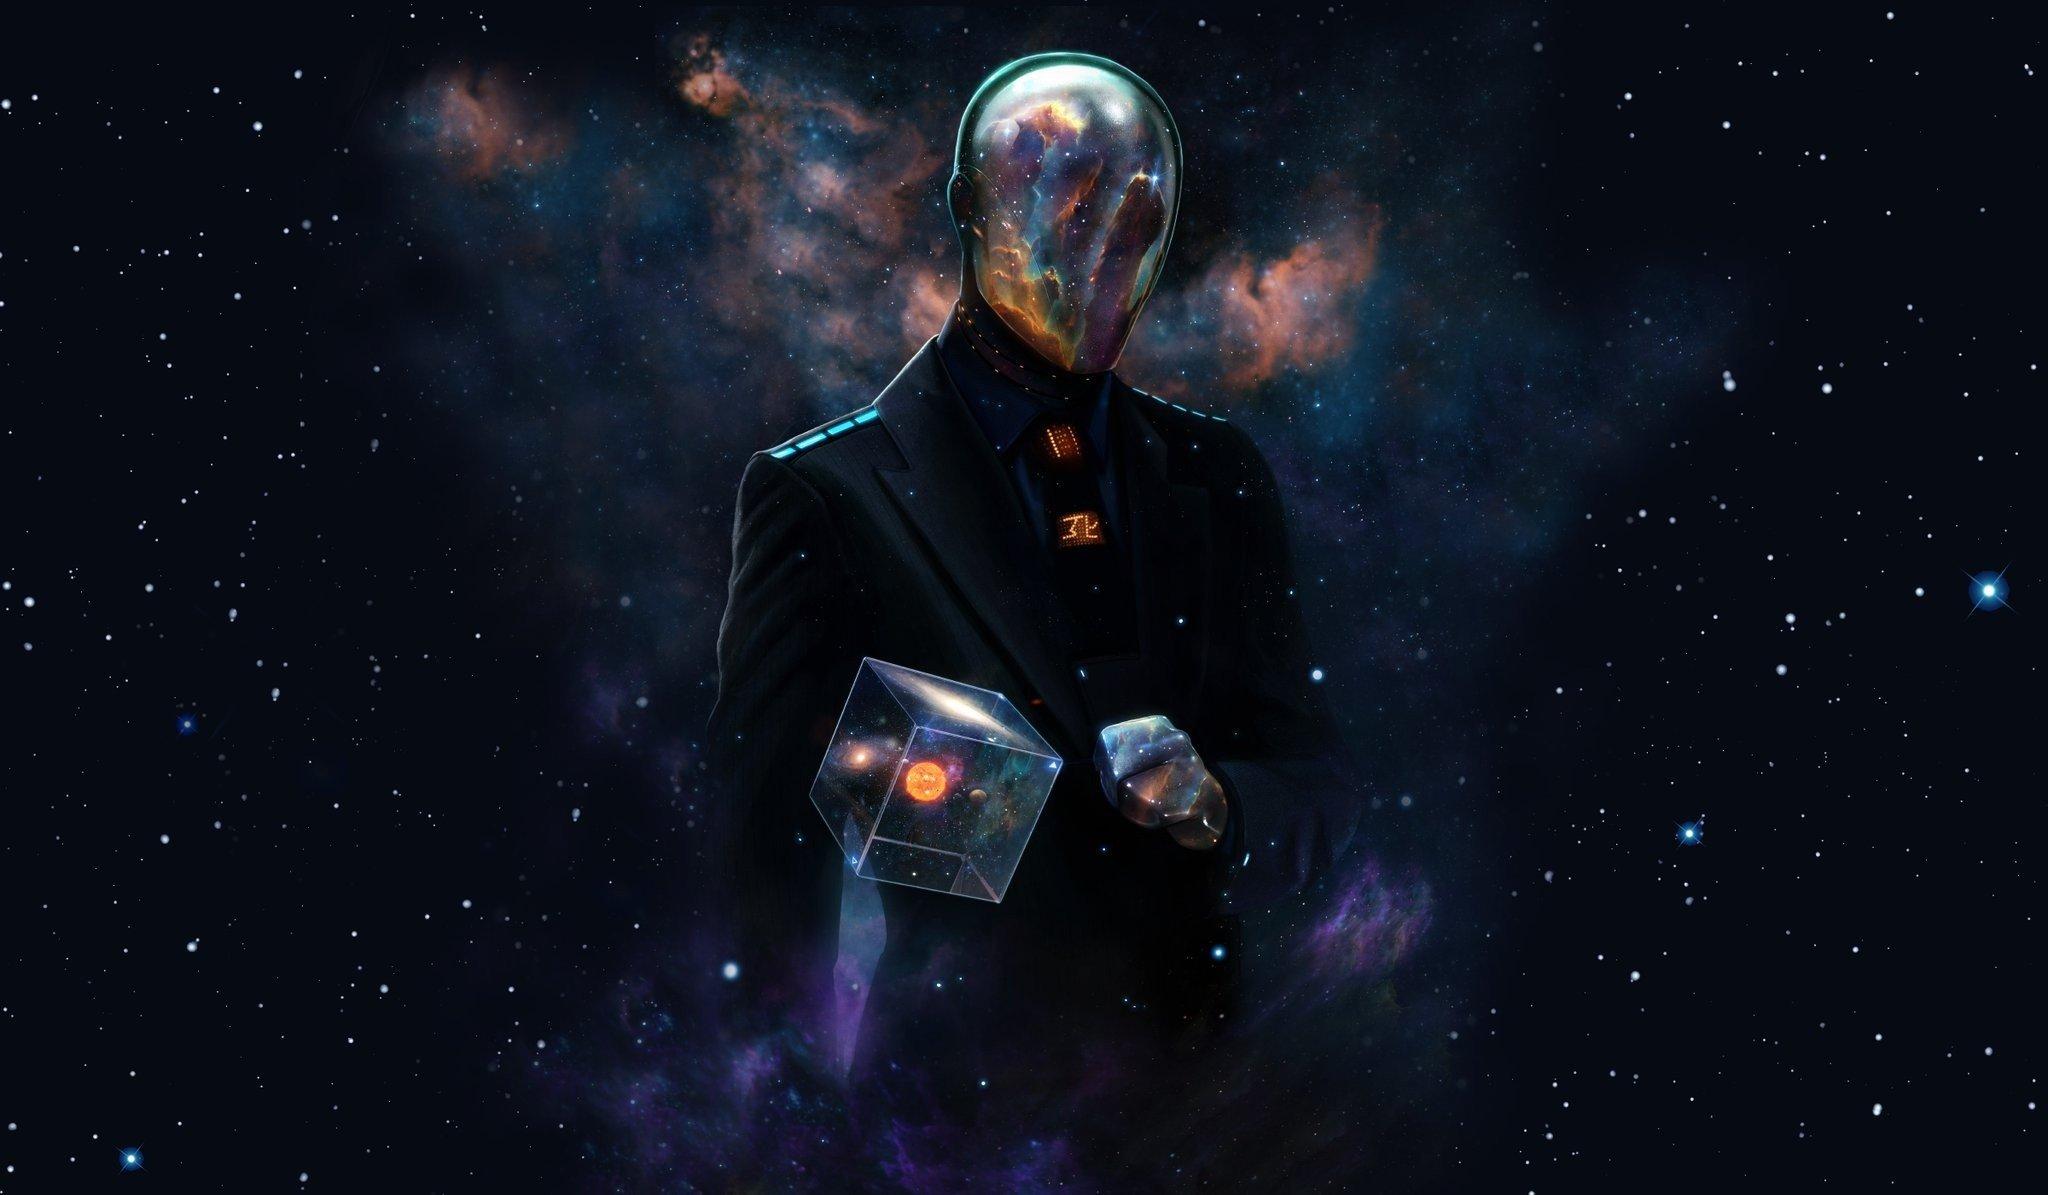 Dan Luvisi Space Universe Suits Helmet Cube Artwork